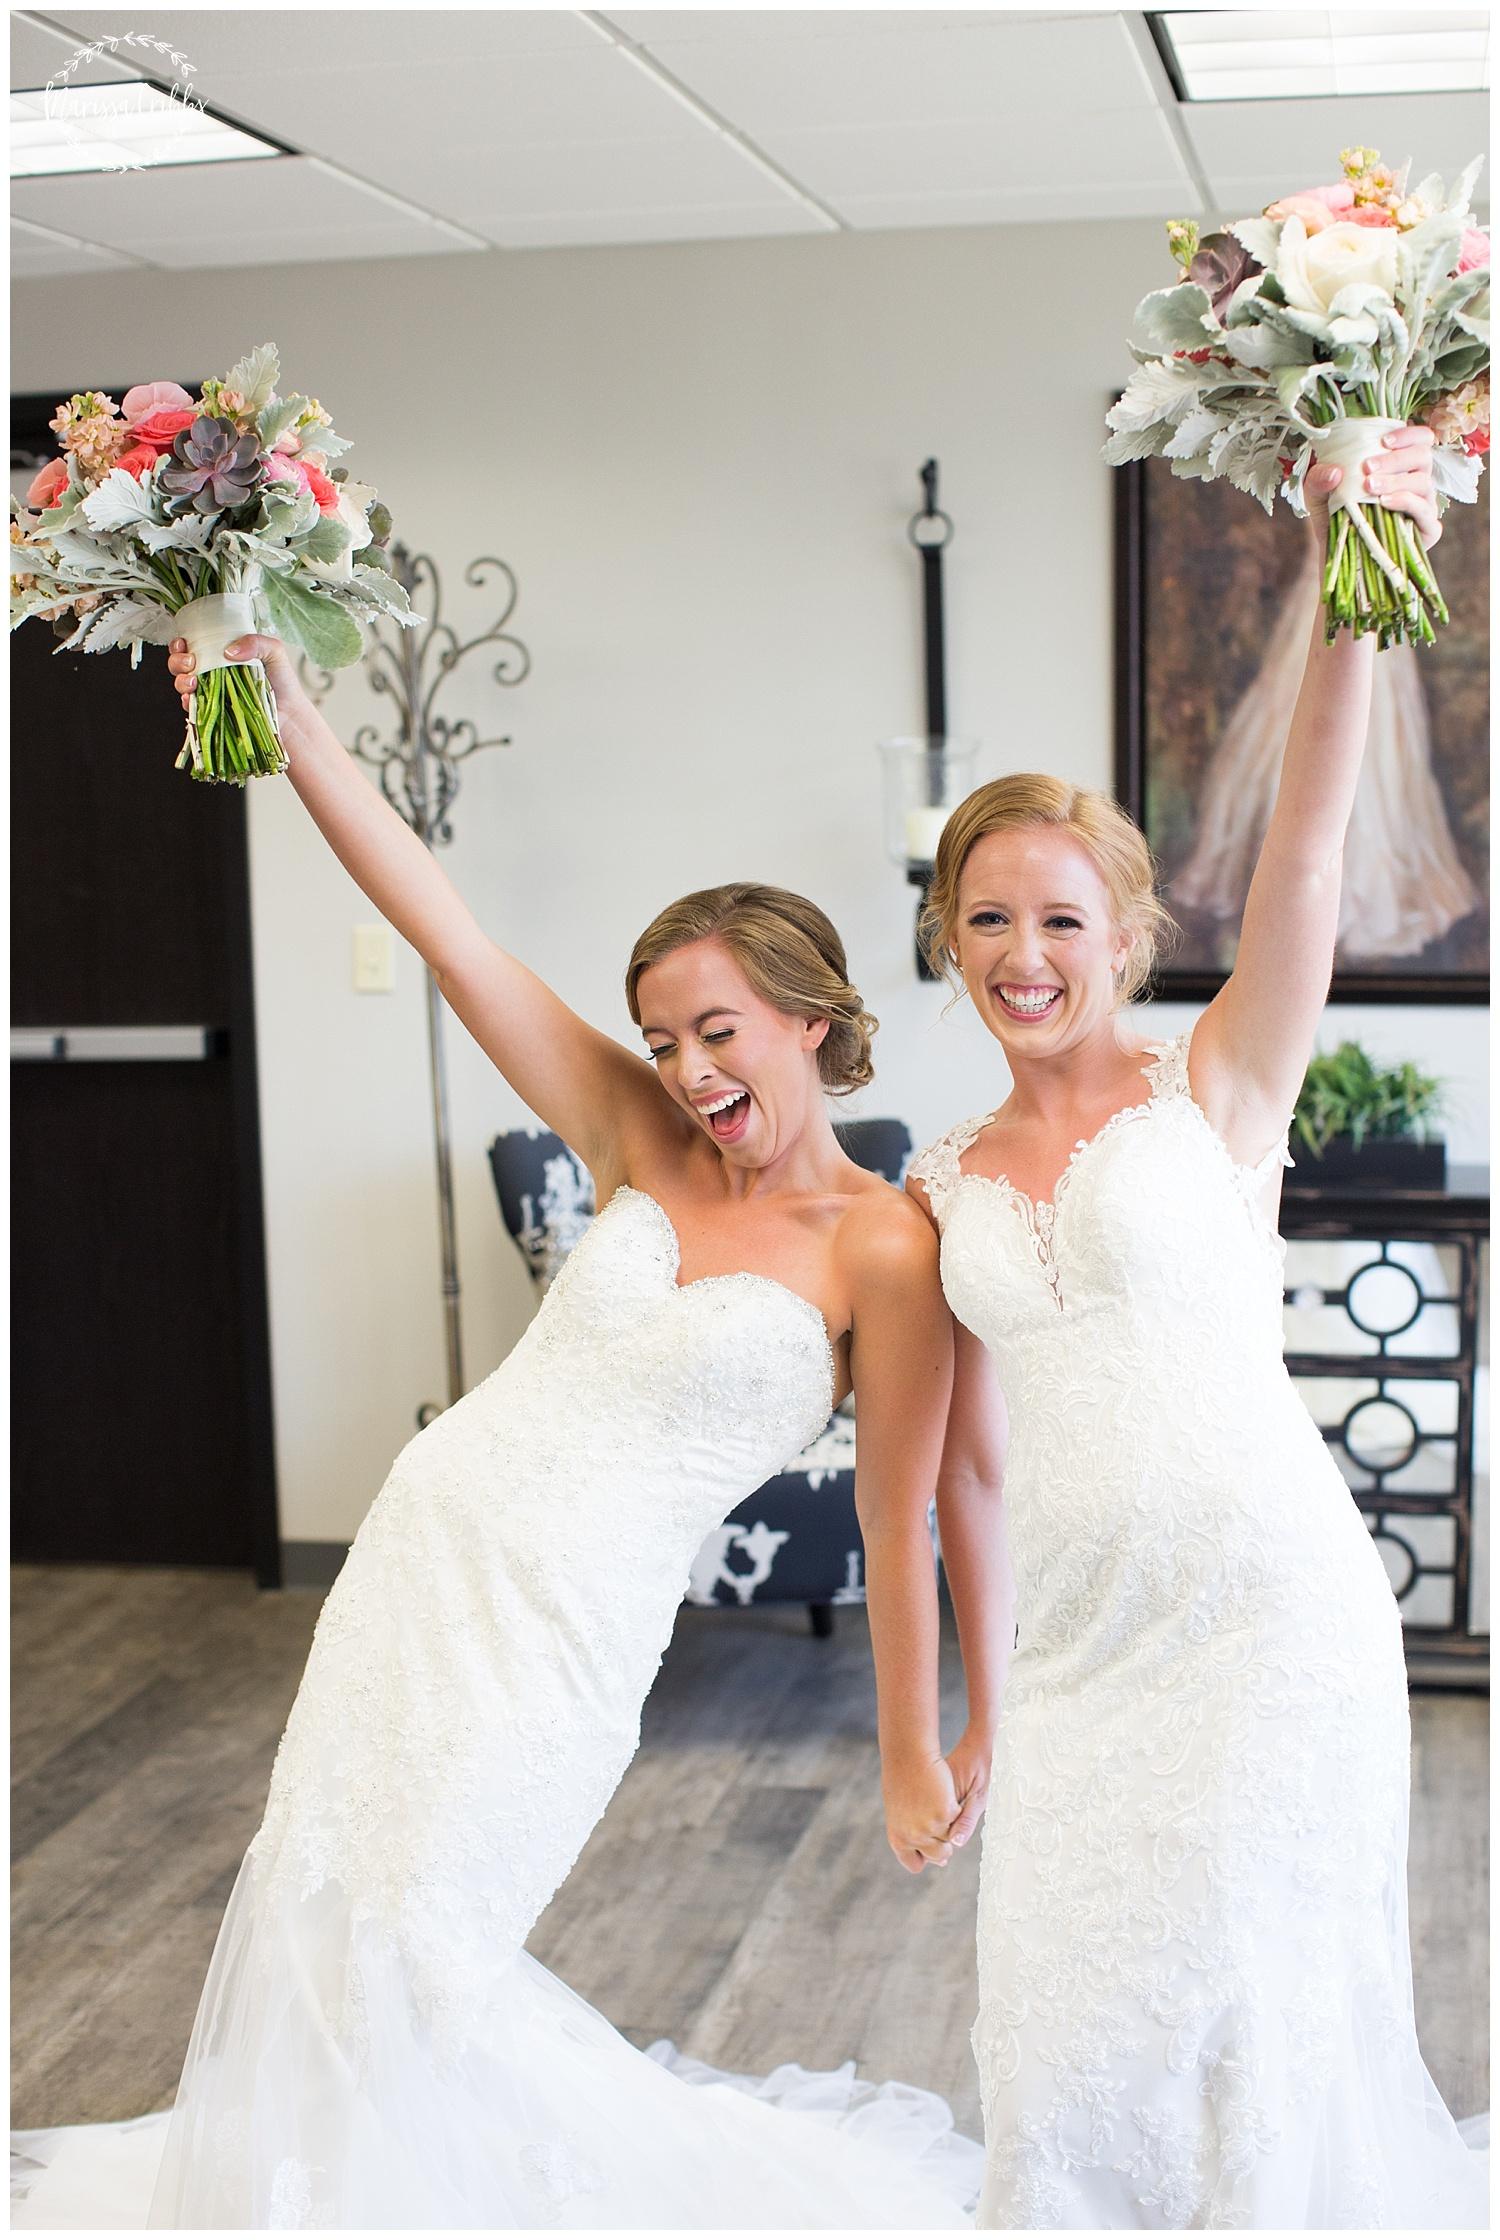 Twin Double Wedding | Union Horse Distilling Co. | Marissa Cribbs Photography | KC Weddings_0030.jpg